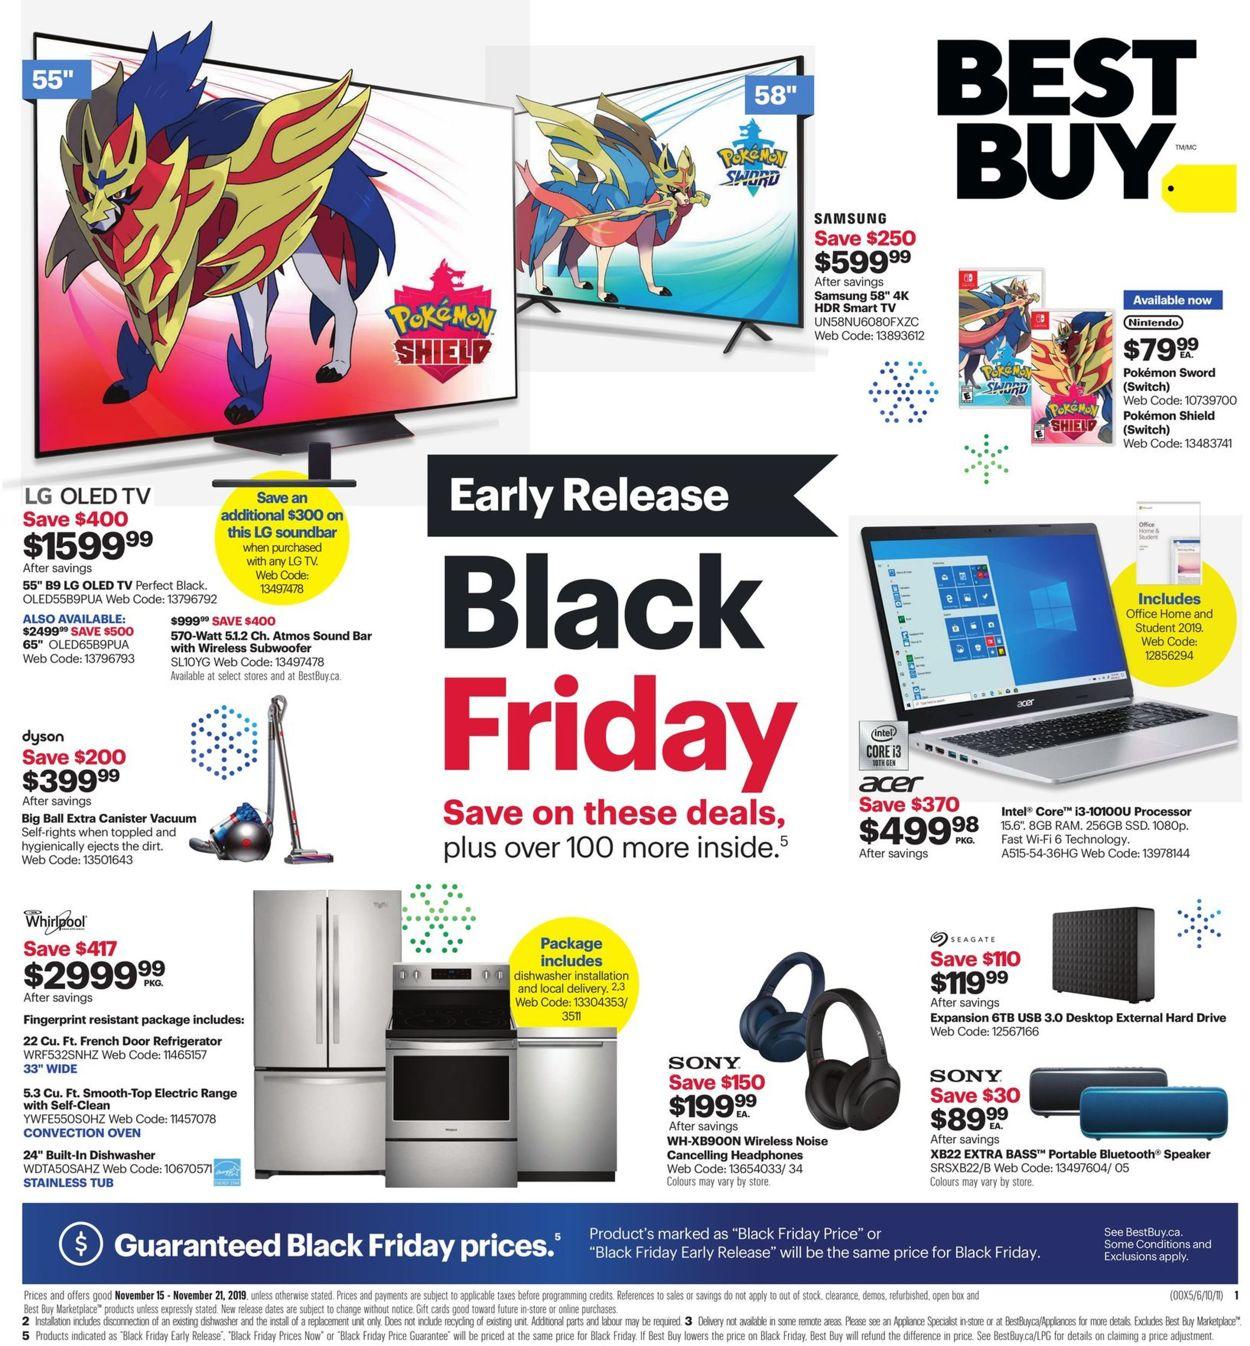 Best Buy - Early Black Friday Flyer 2019